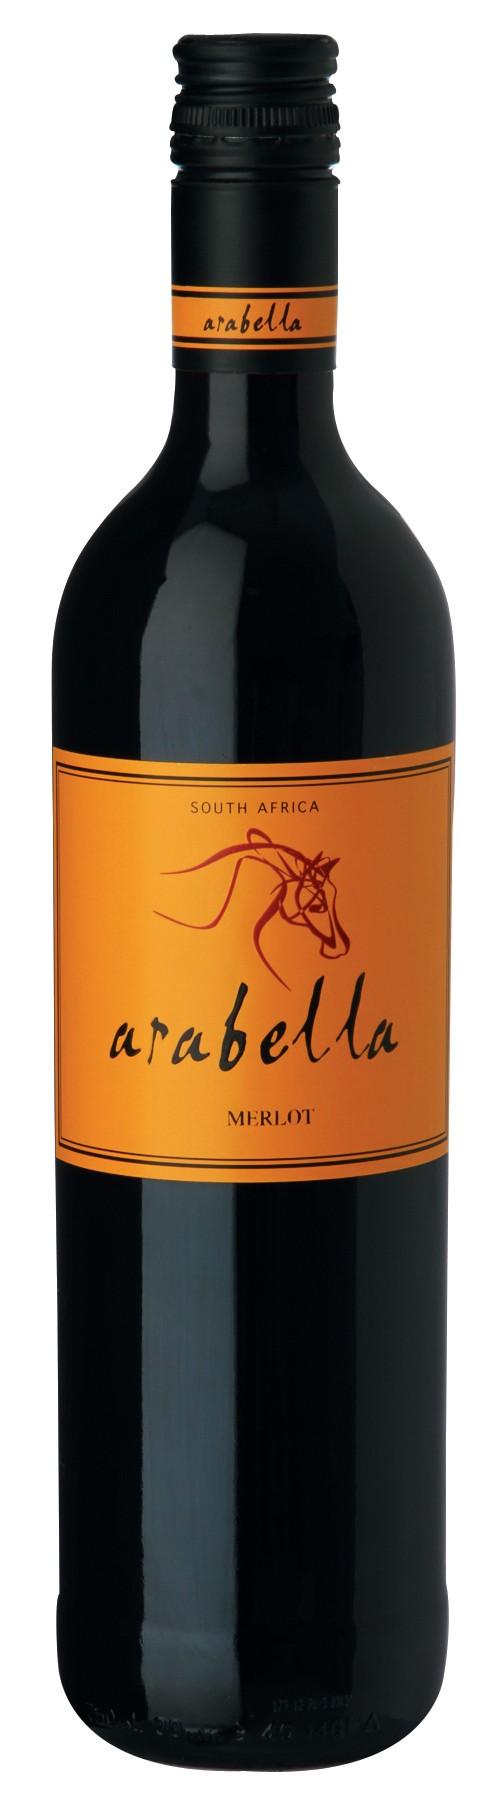 Arabella Merlot